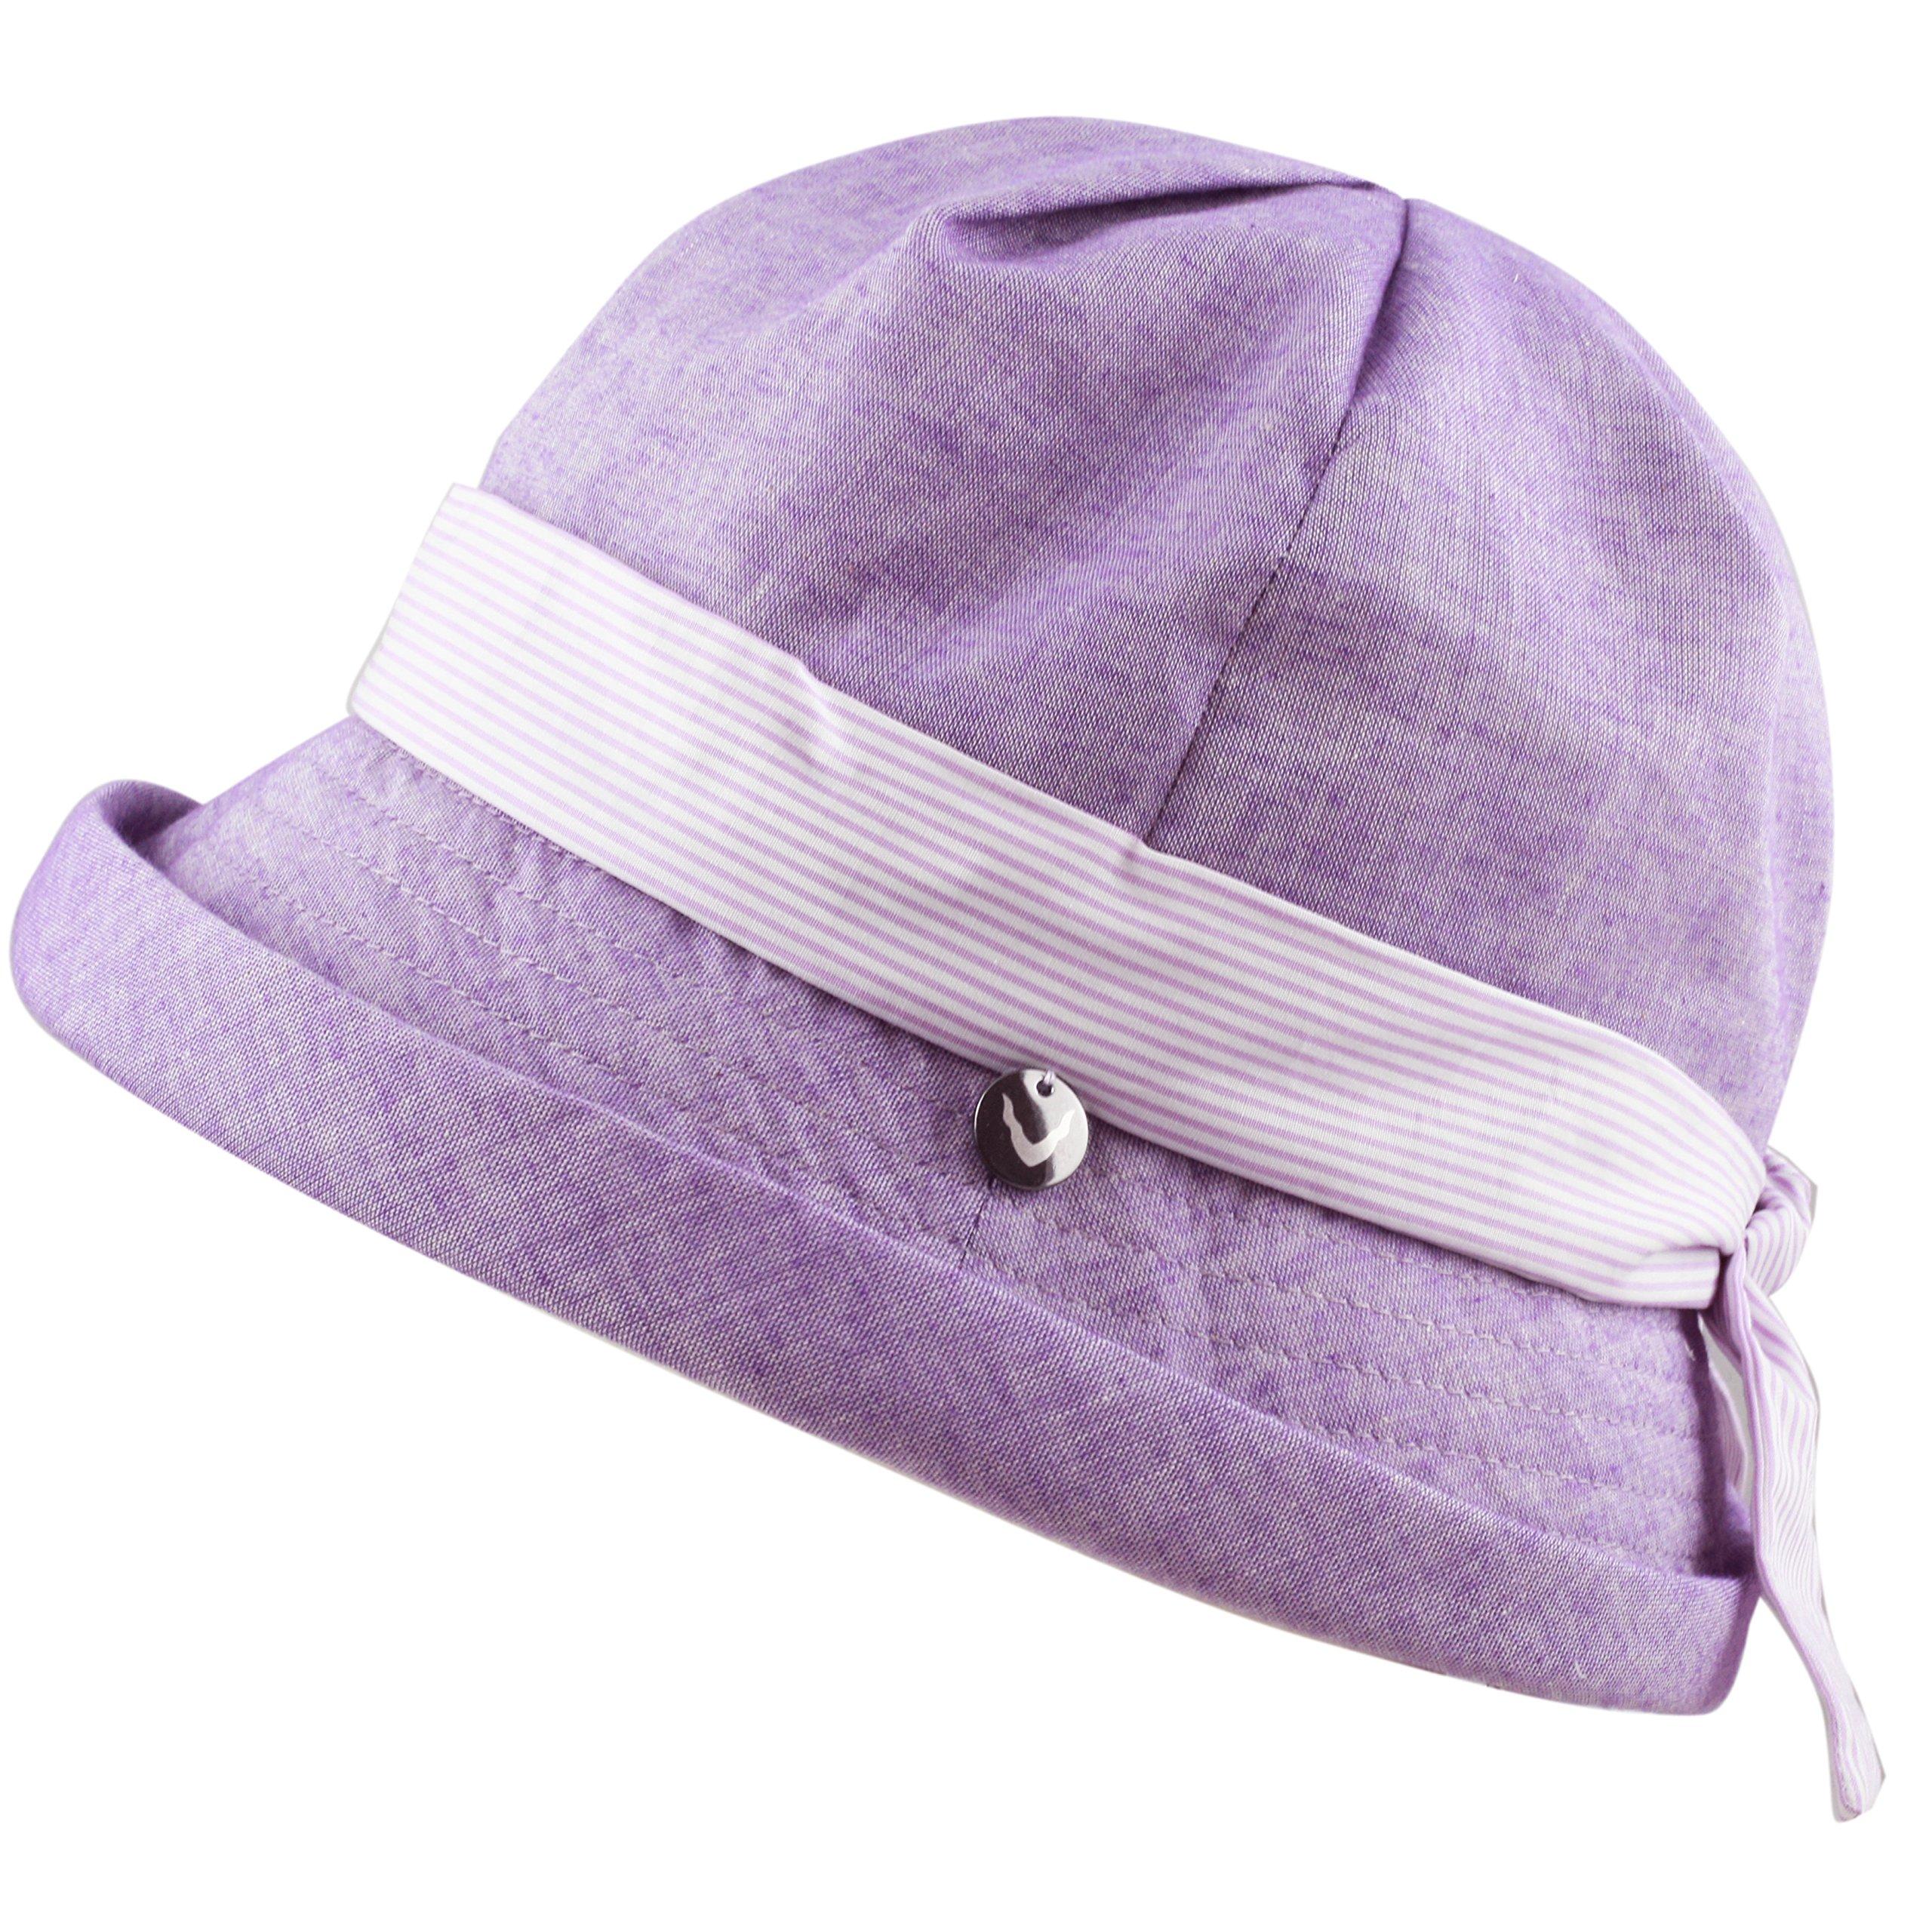 BLACK HORN Ladies Packable Women's Sun Beach Bucket Hat (Elise-Lavender)